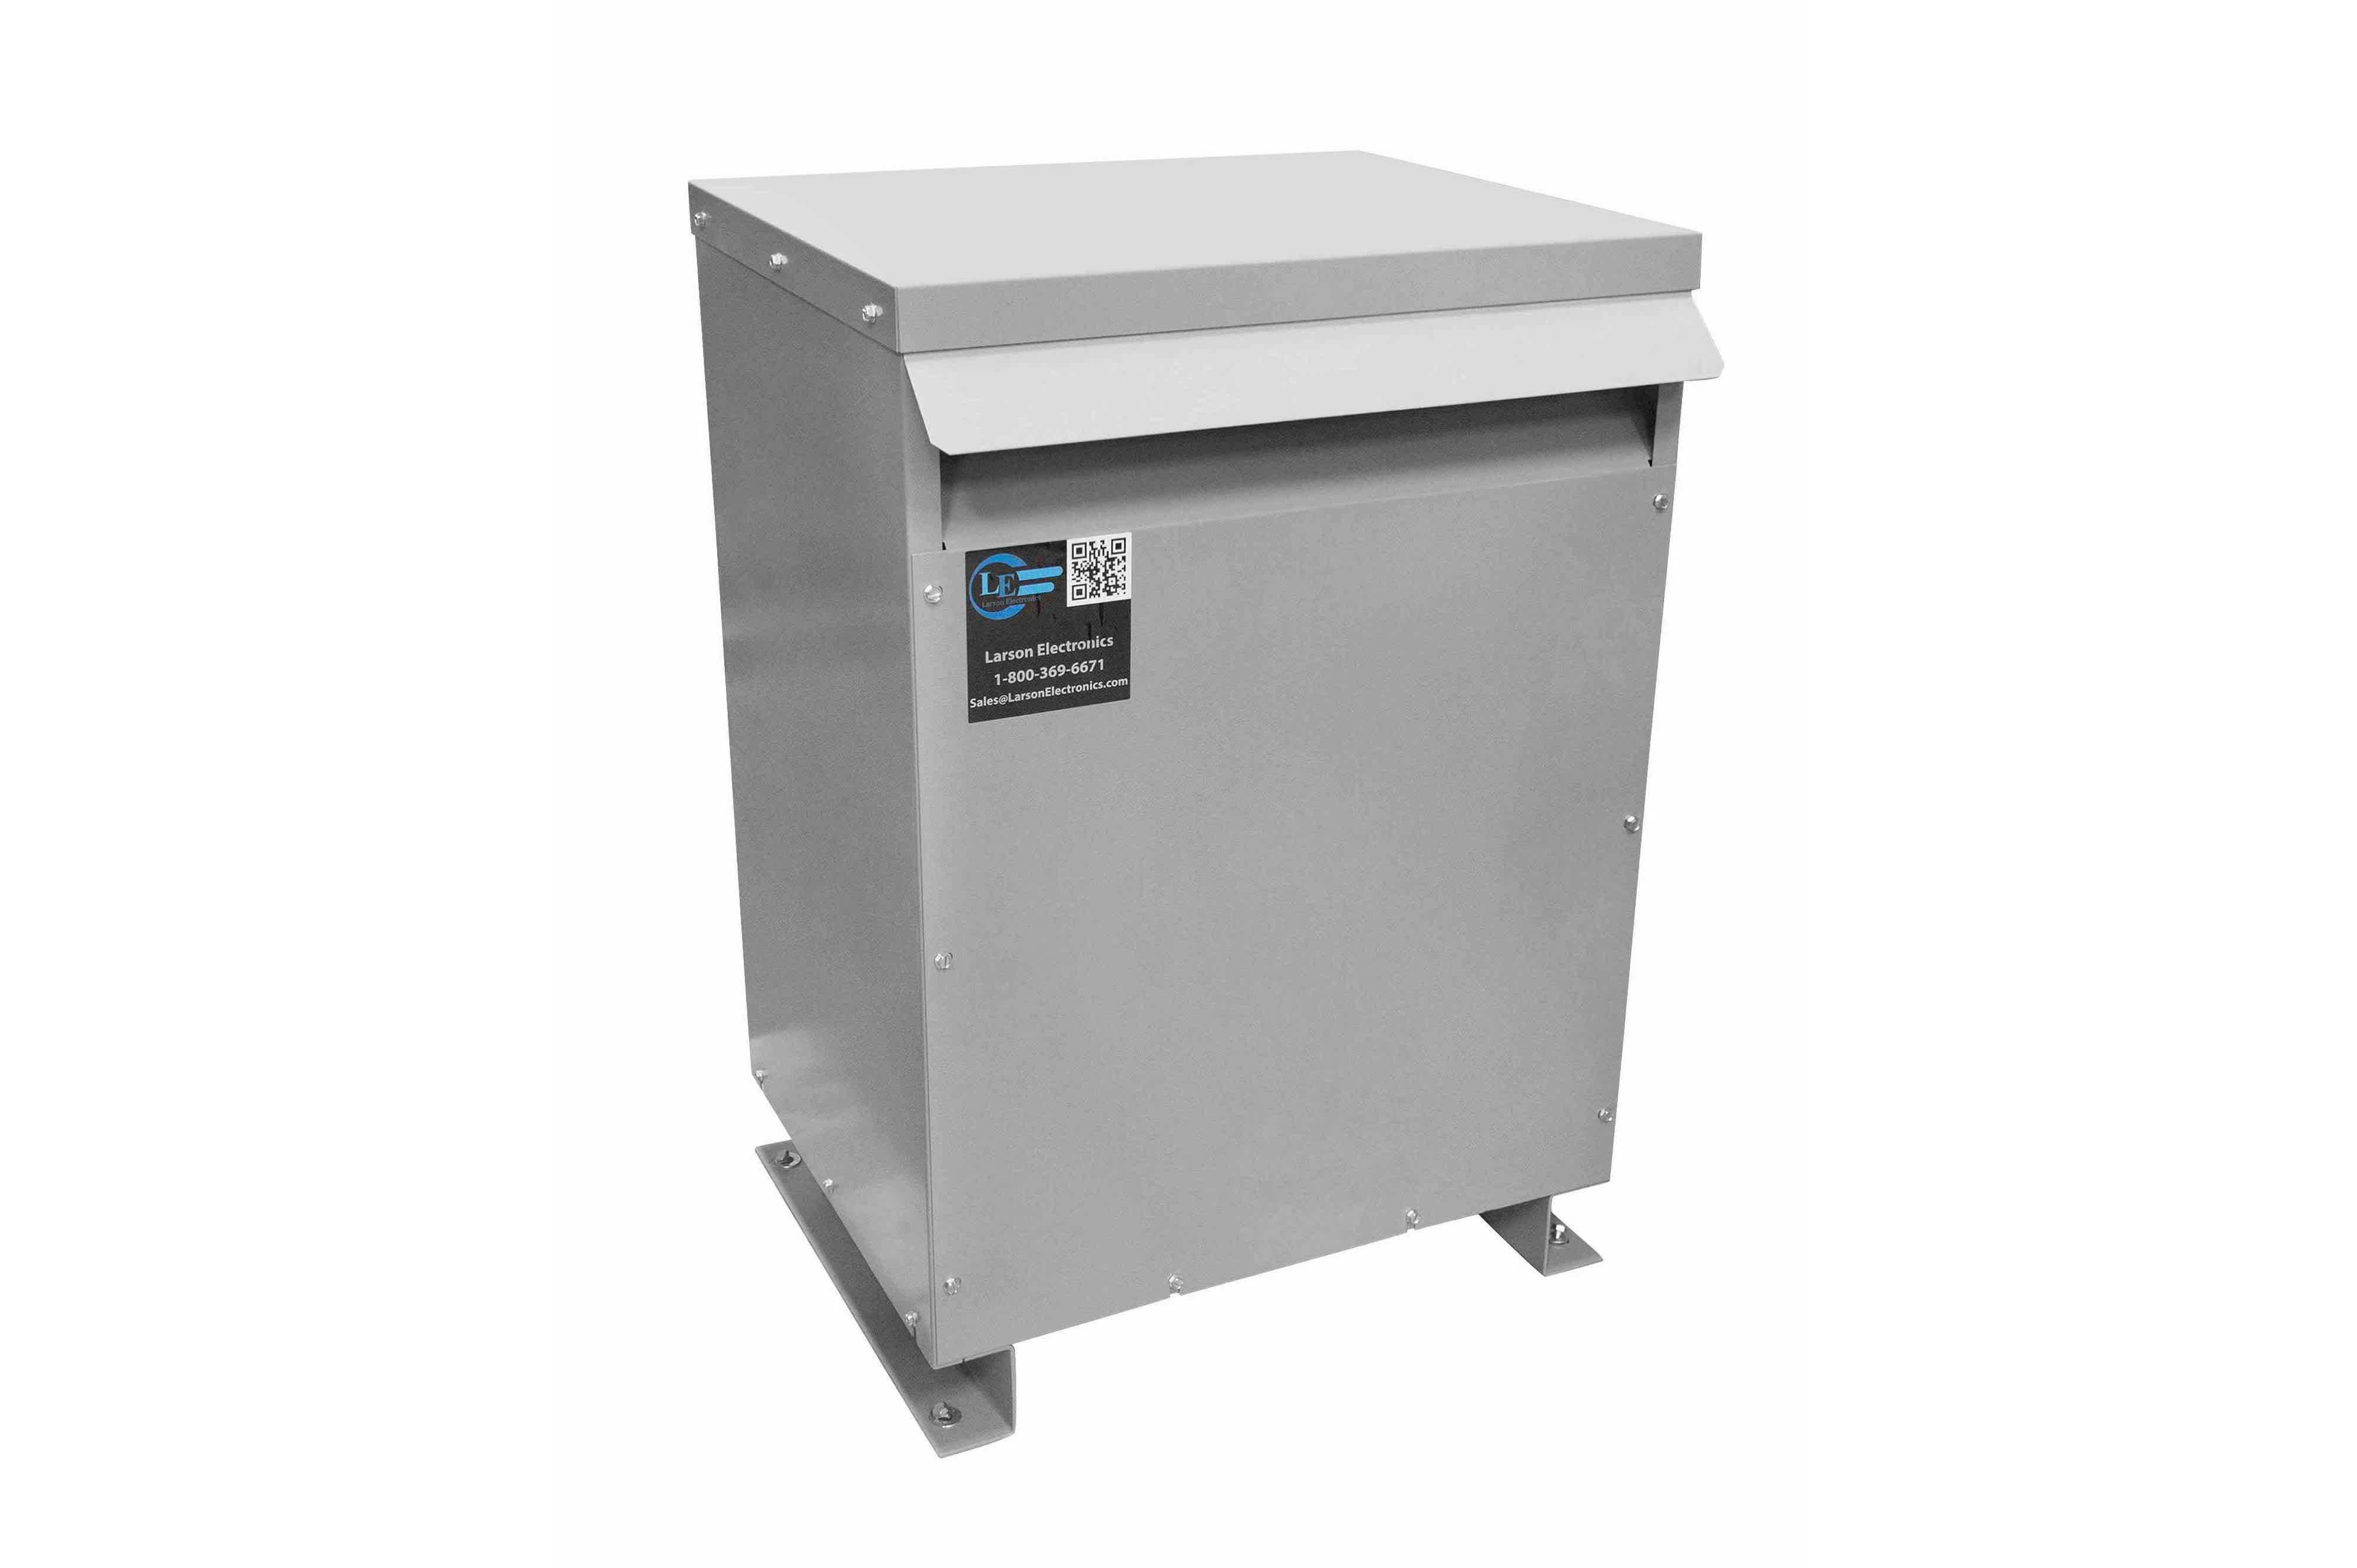 18 kVA 3PH Isolation Transformer, 460V Wye Primary, 575V Delta Secondary, N3R, Ventilated, 60 Hz